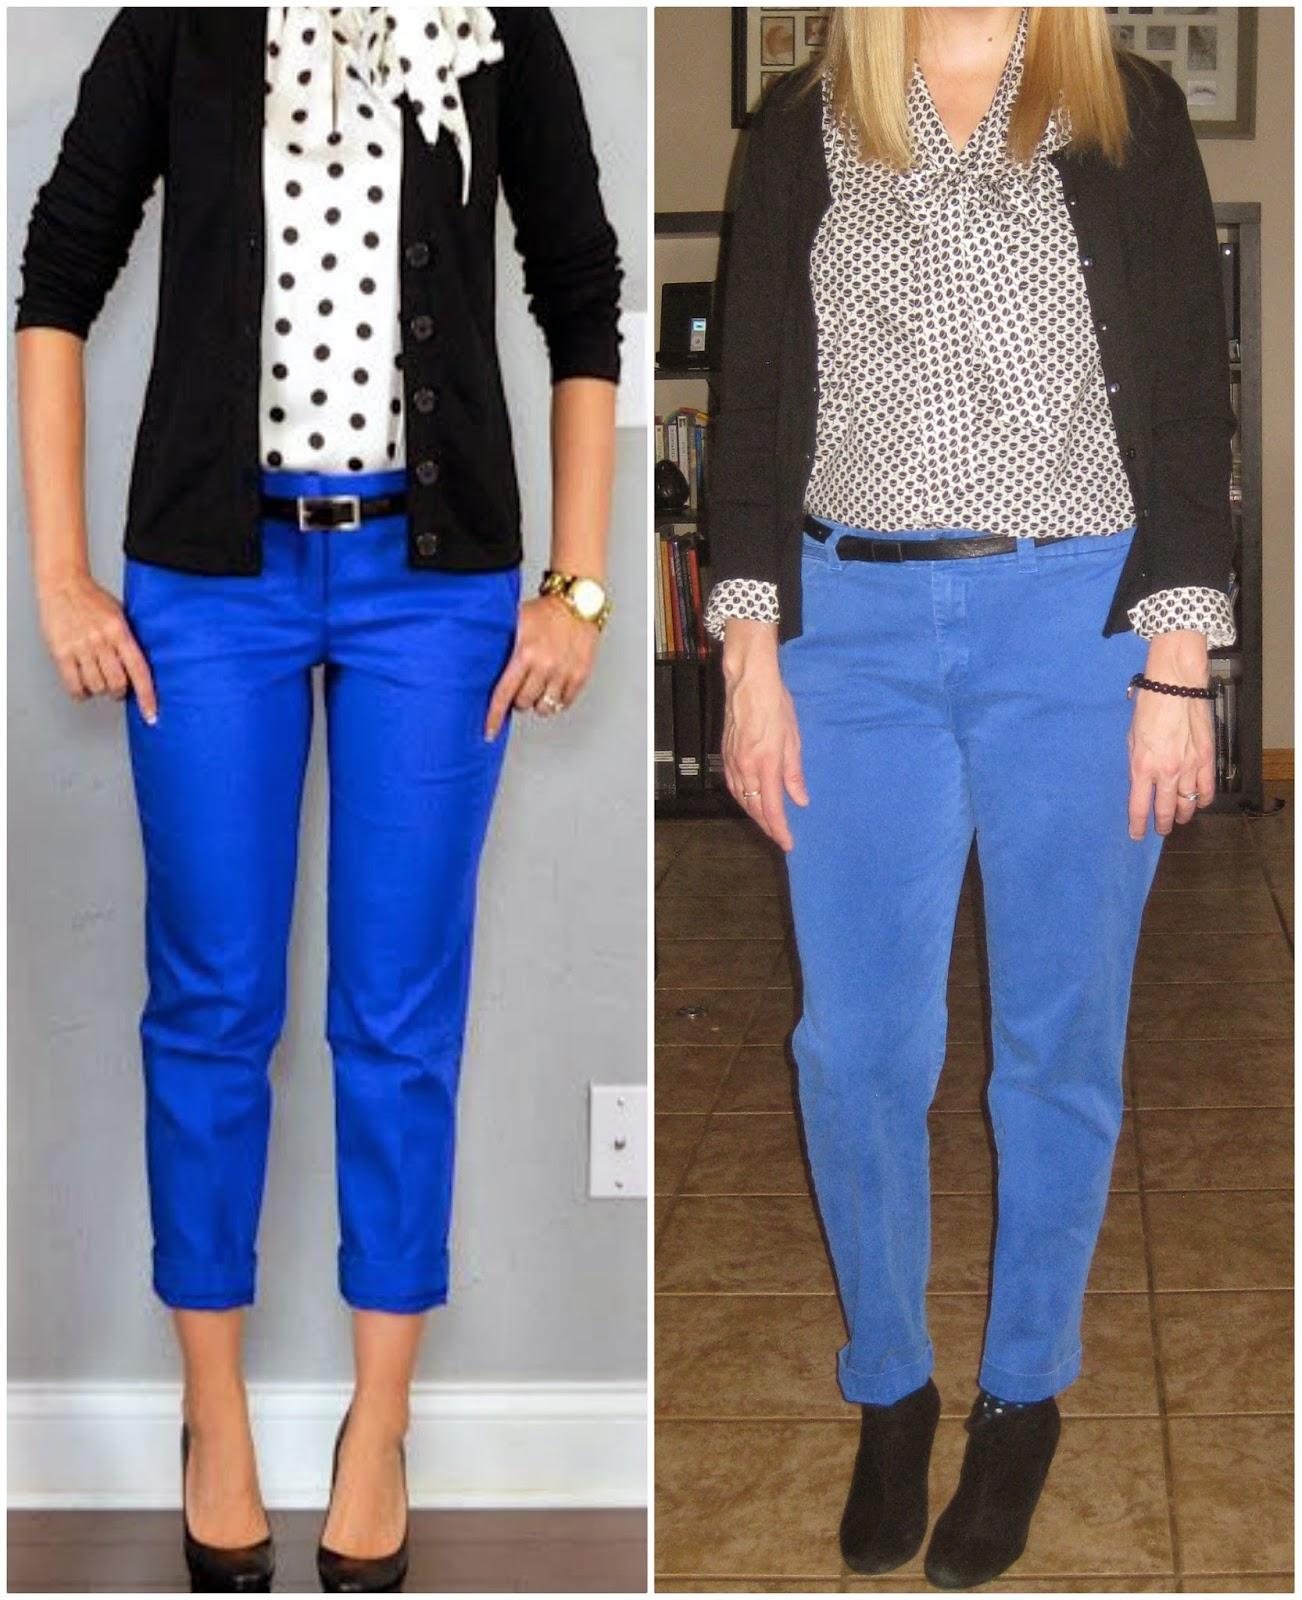 VV Boutique Style: Stripe on Stripe | Mom style, Fashion